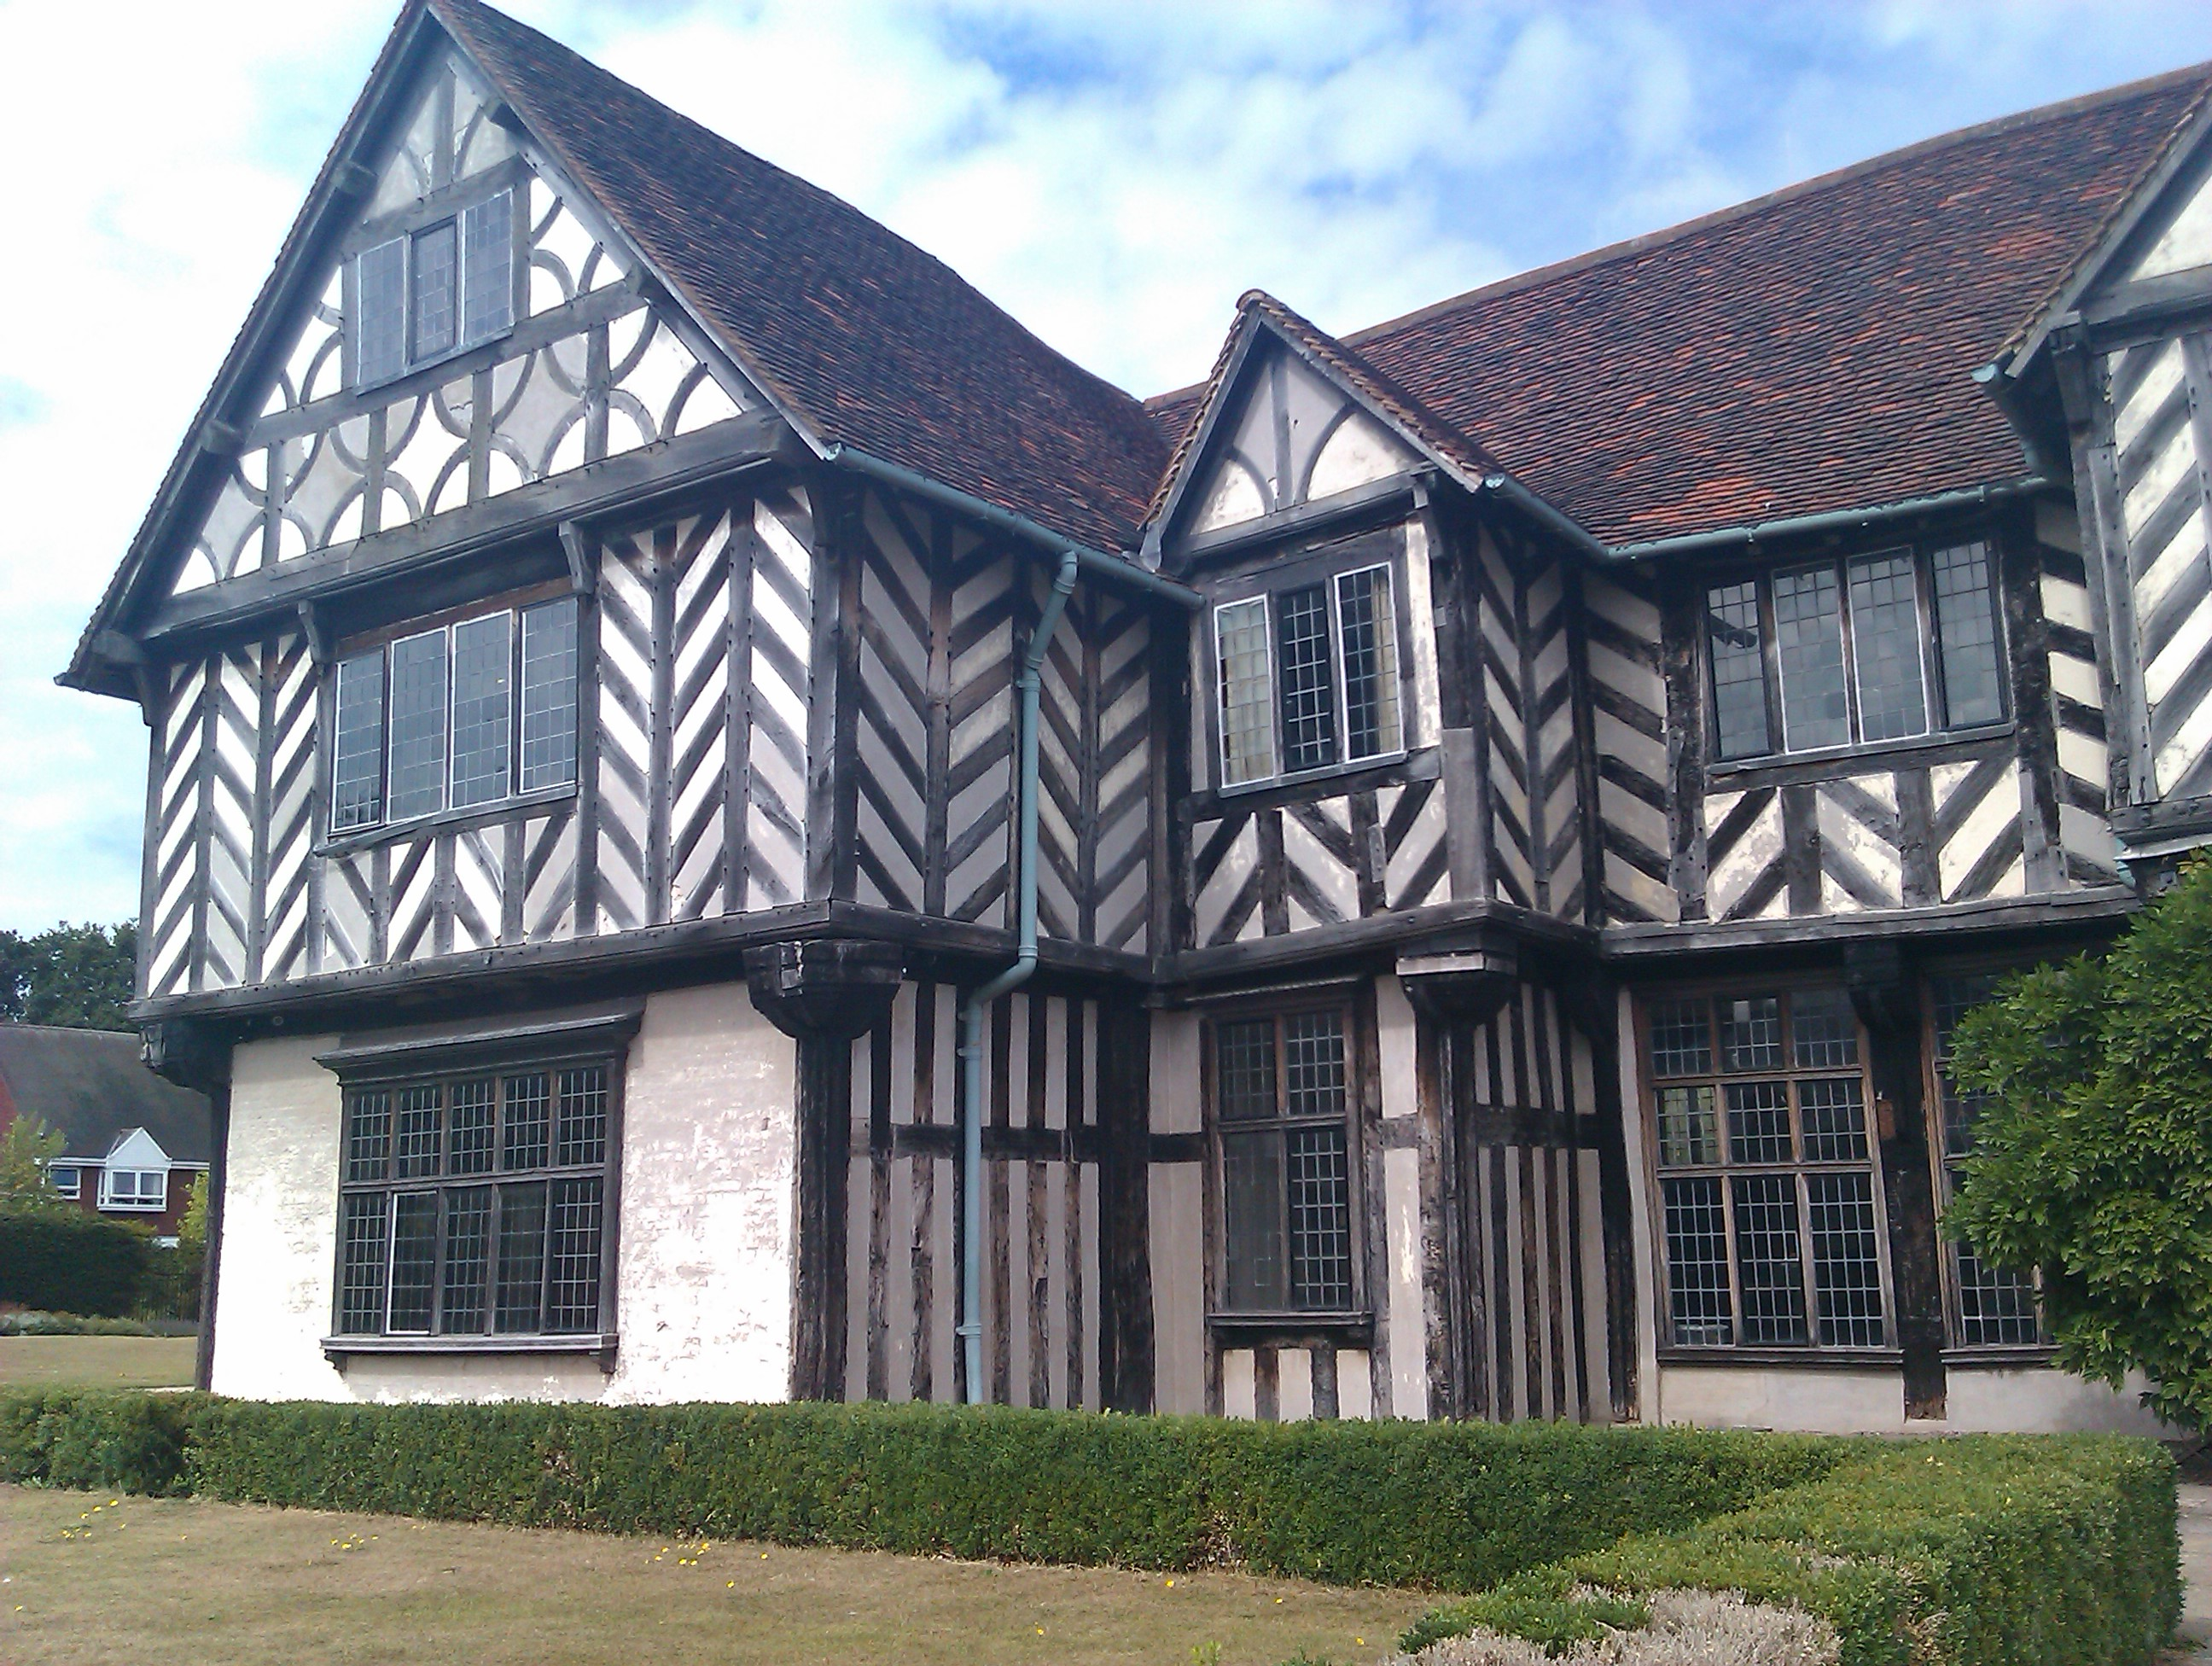 Tudor hall, Architecture, Beams, Birmingham, Farmhouse, HQ Photo